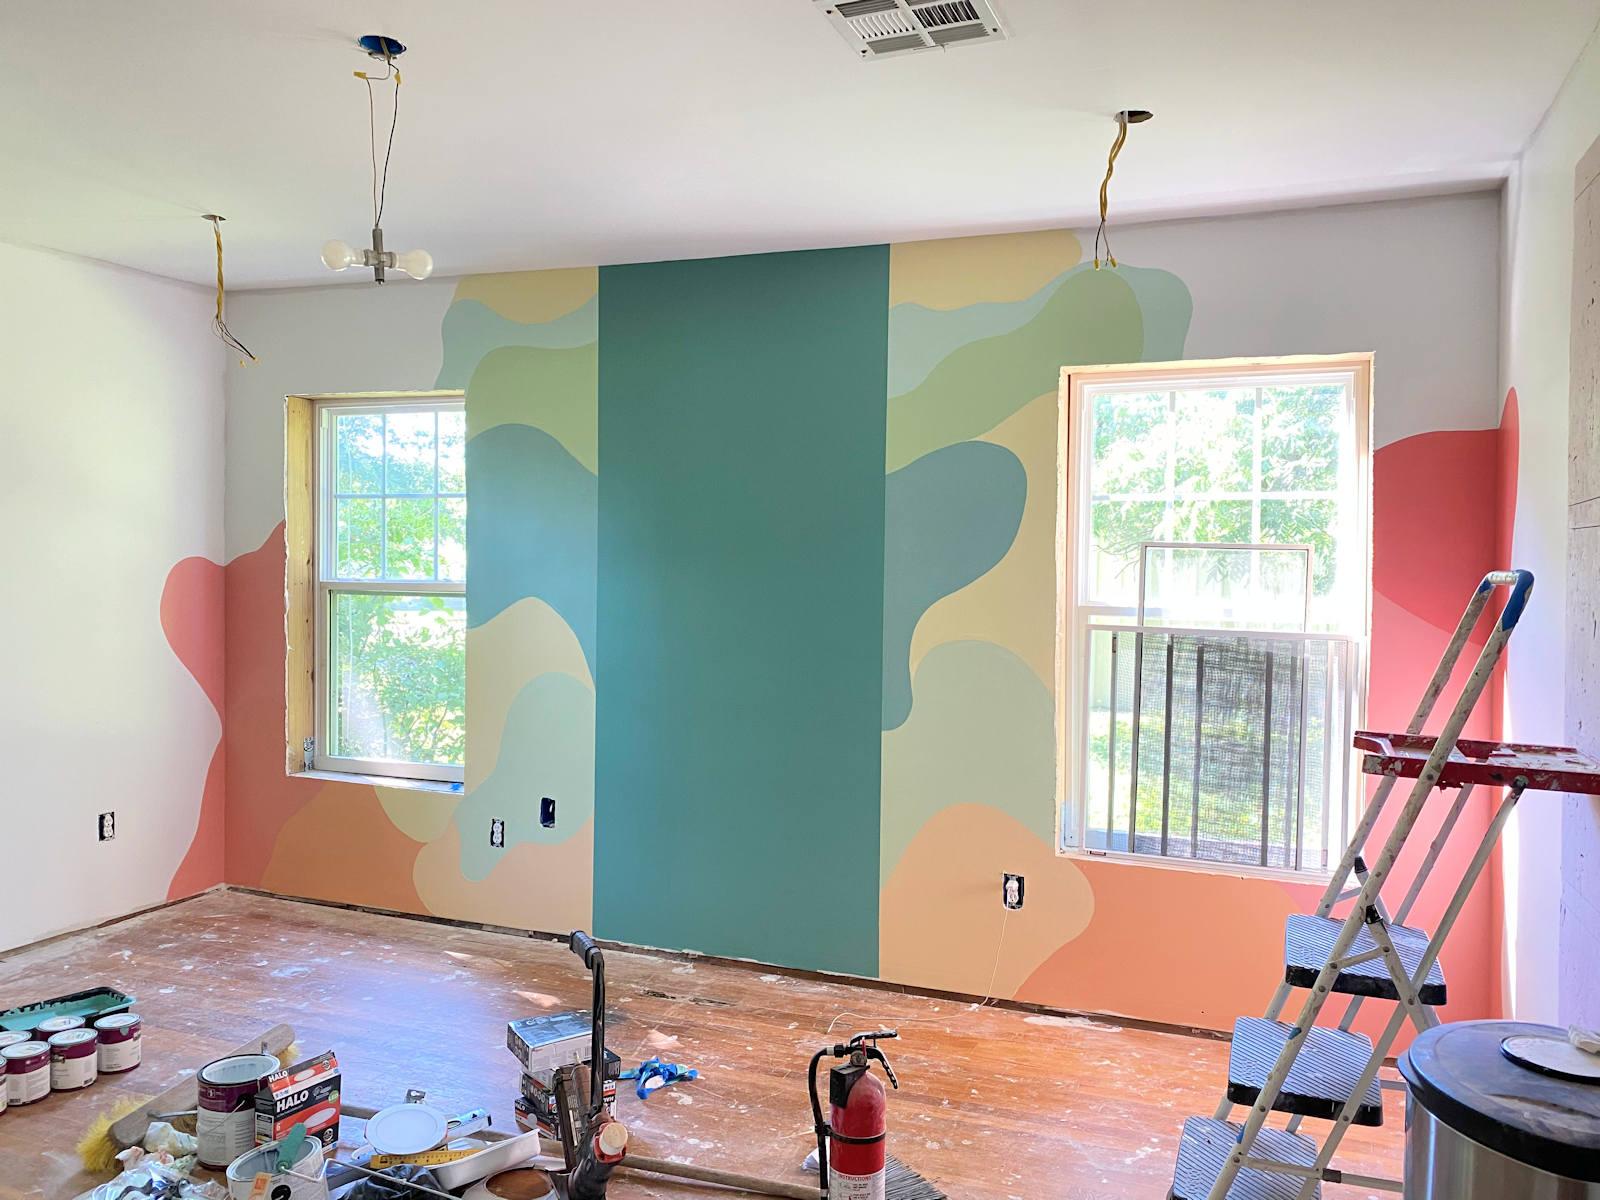 home gym walls with freeform design 7